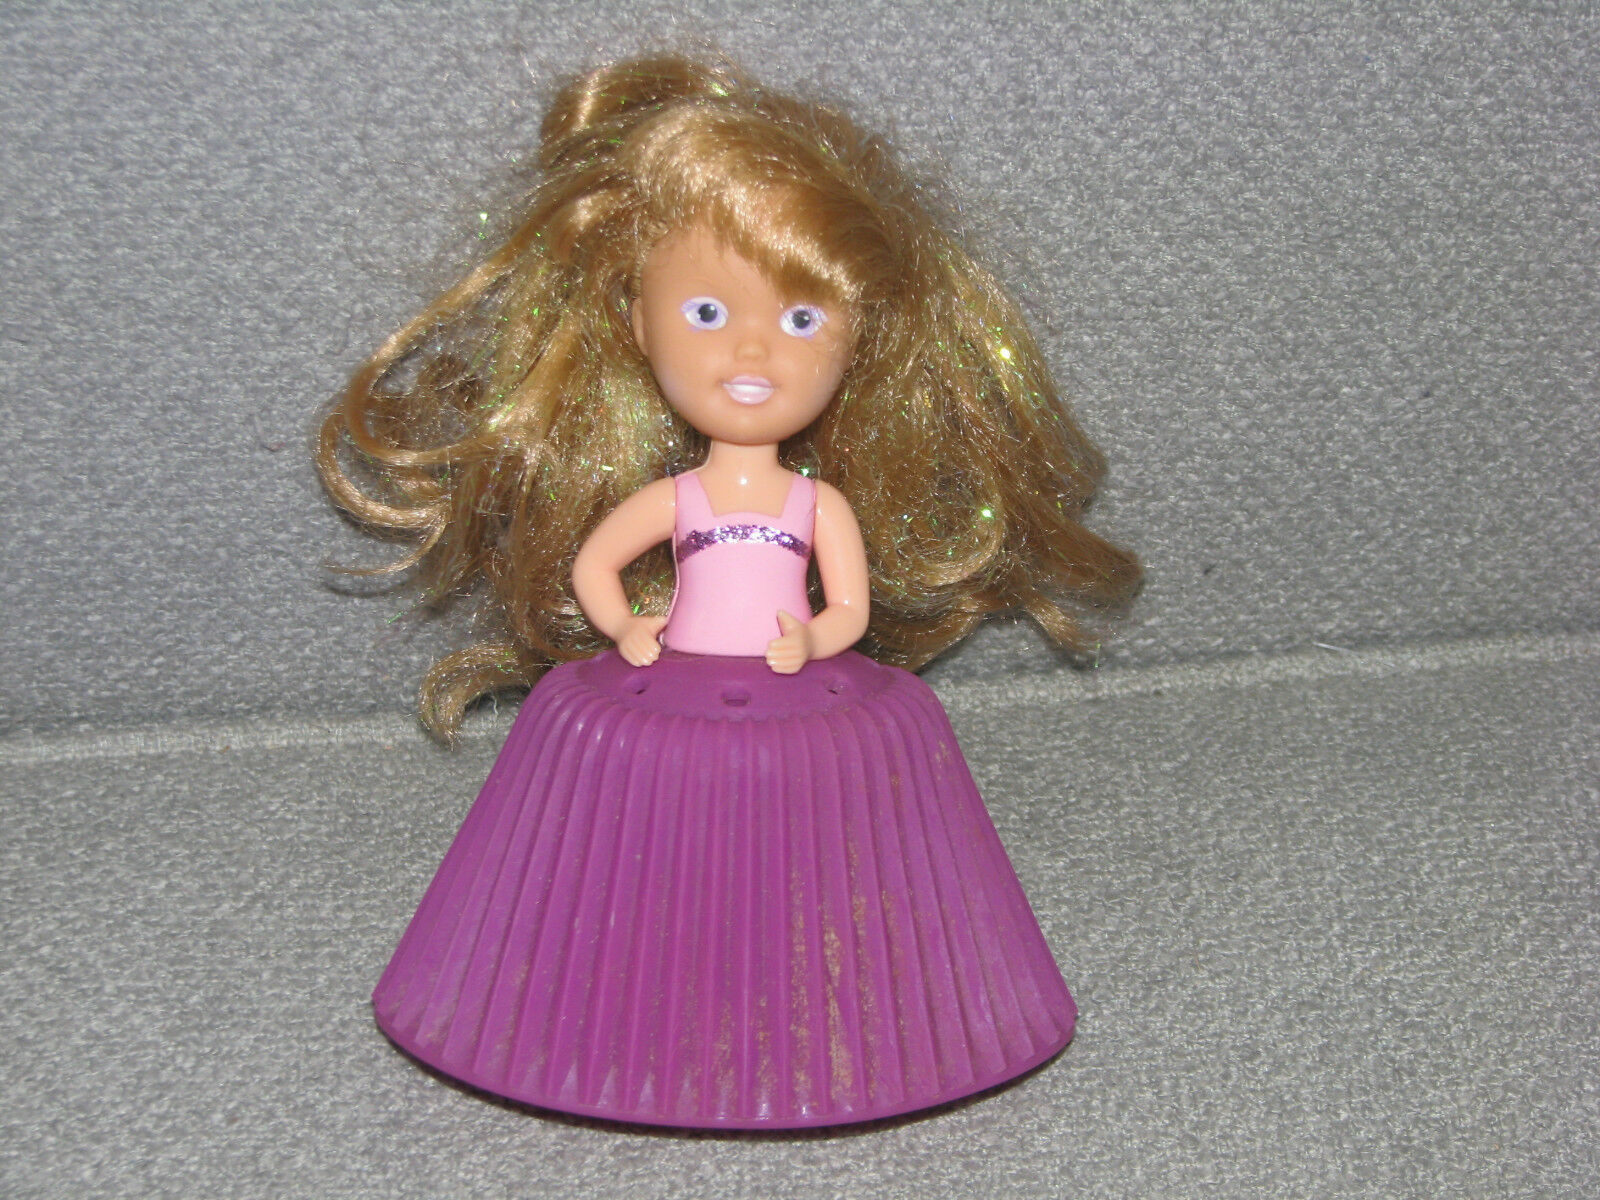 TONKA CUPCAKE DOLLS PINK PURPLE GIRL - $17.22